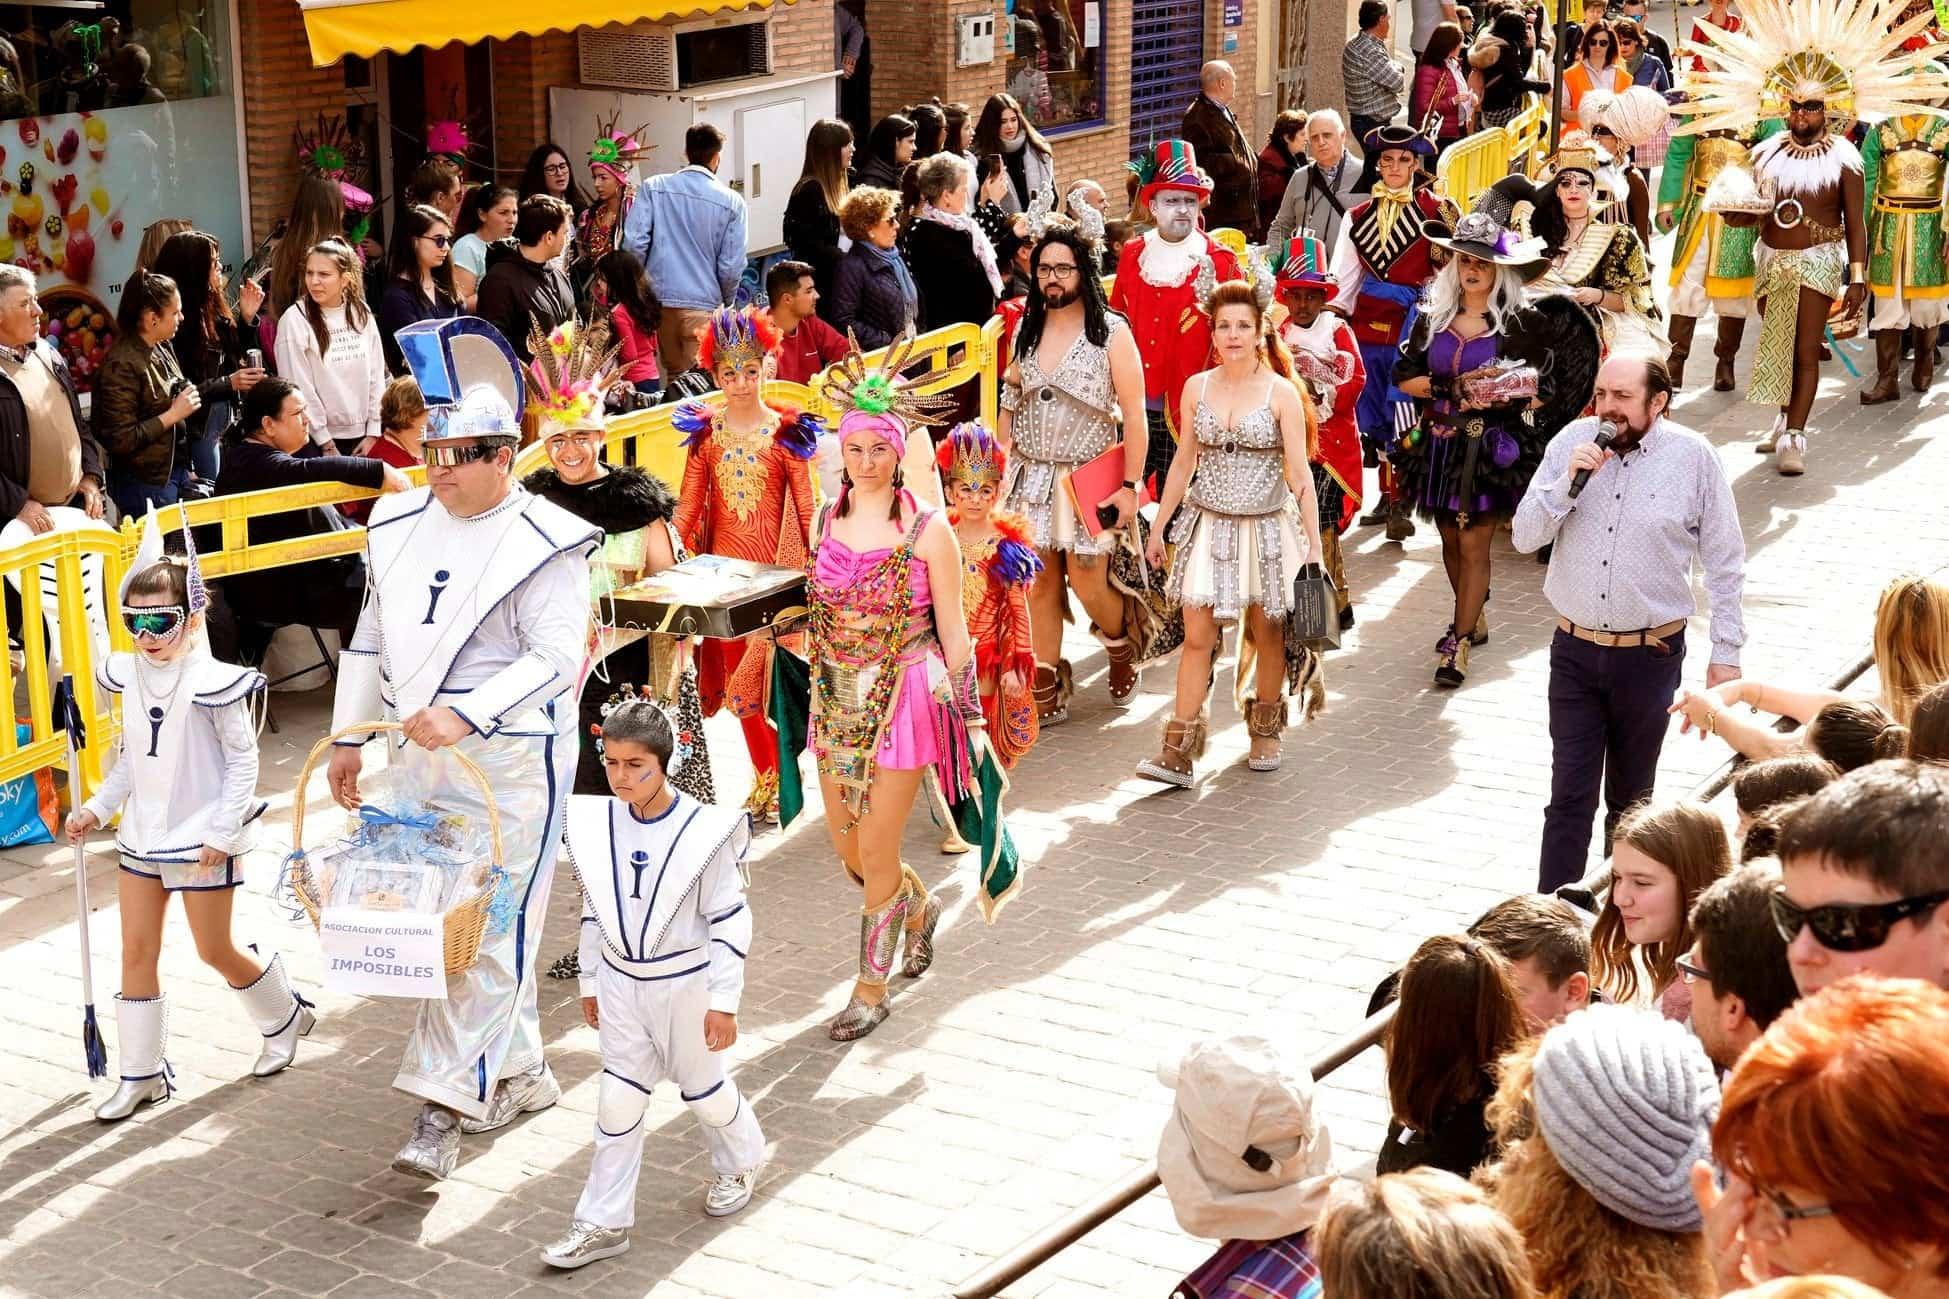 Carnaval de herencia 2020 ofertorio 54 - Selección de fotografías del Ofertorio del Carnaval de Herencia